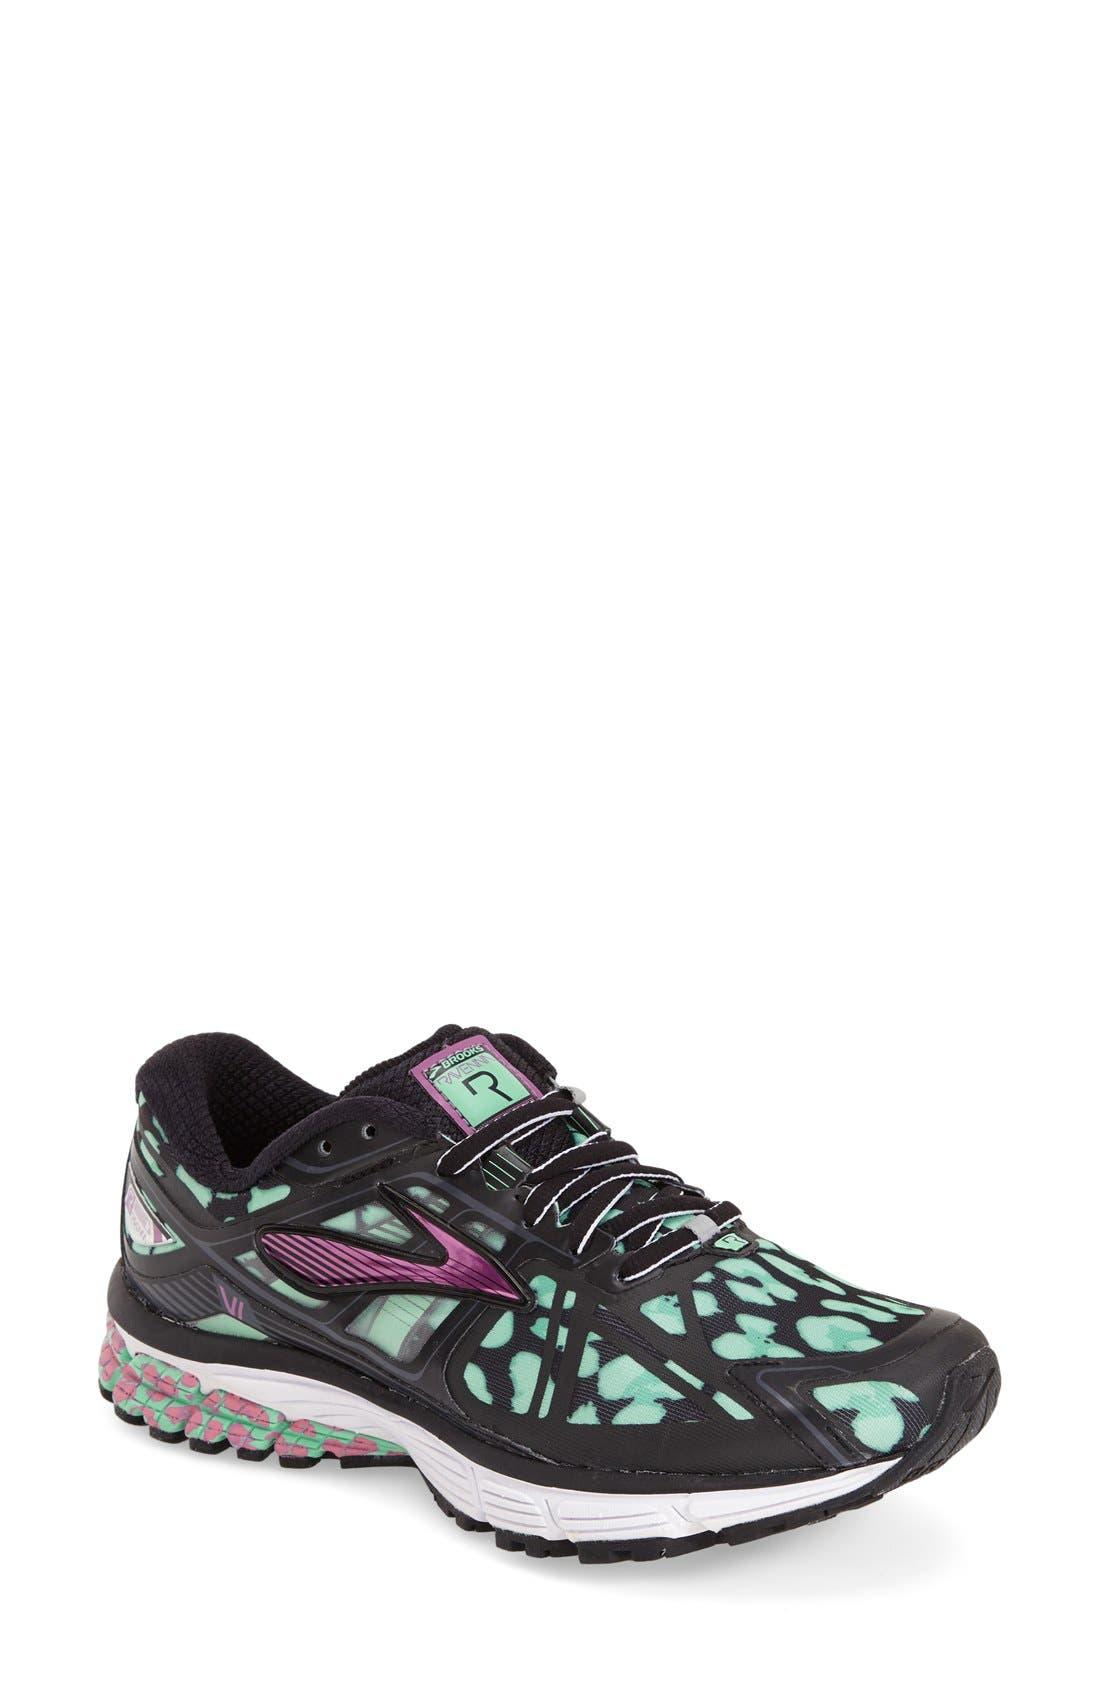 Alternate Image 1 Selected - Brooks 'Ravenna 6' Running Shoe (Women)